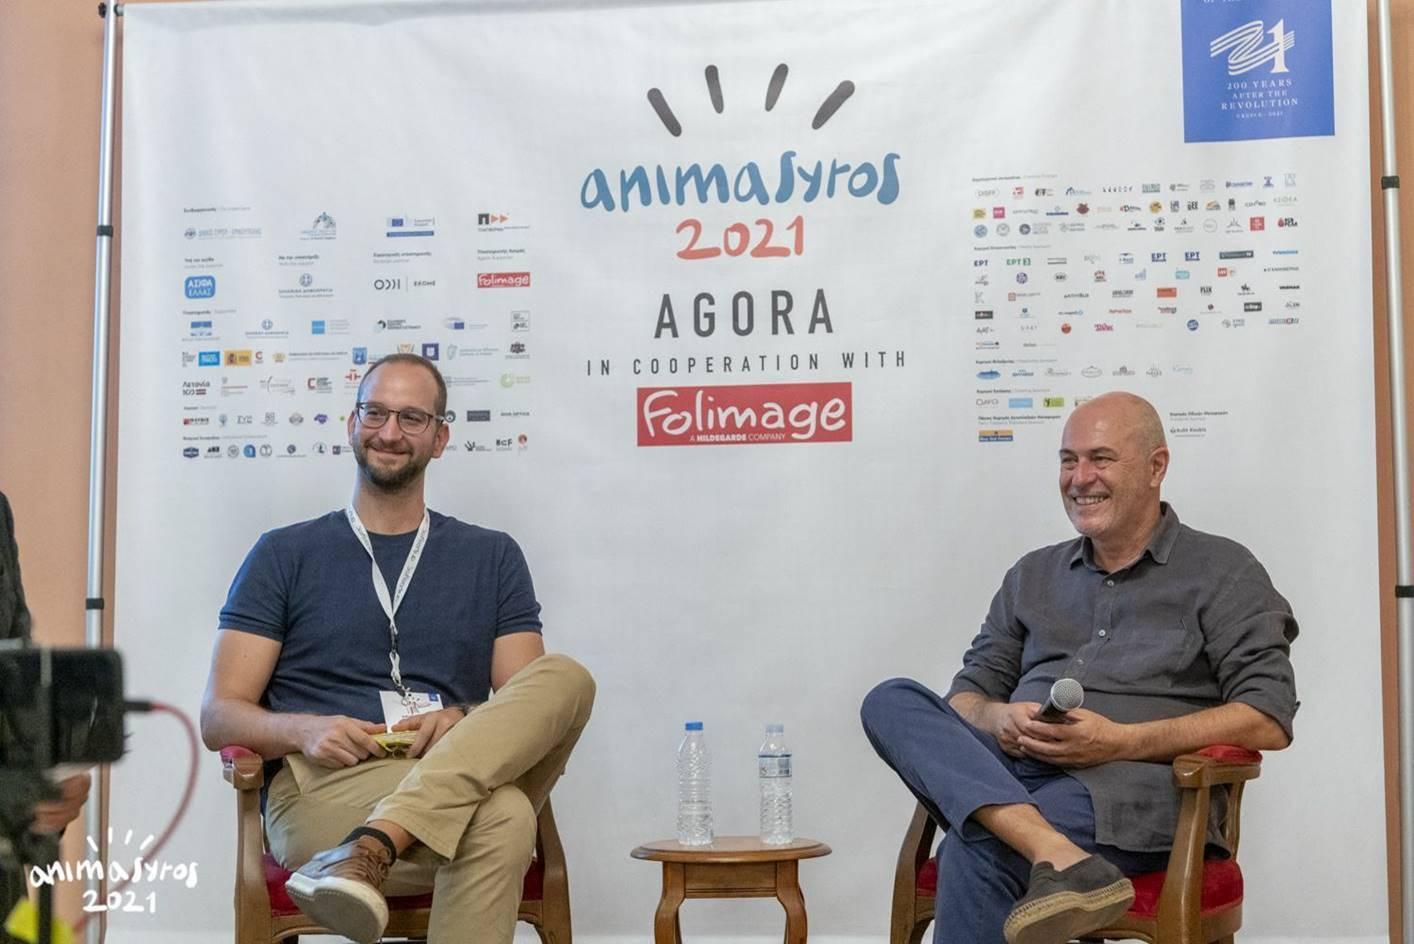 Animation Challenge με αφορμή τα 40 χρόνια από την ένταξη της Ελλάδας στην ΕΕ